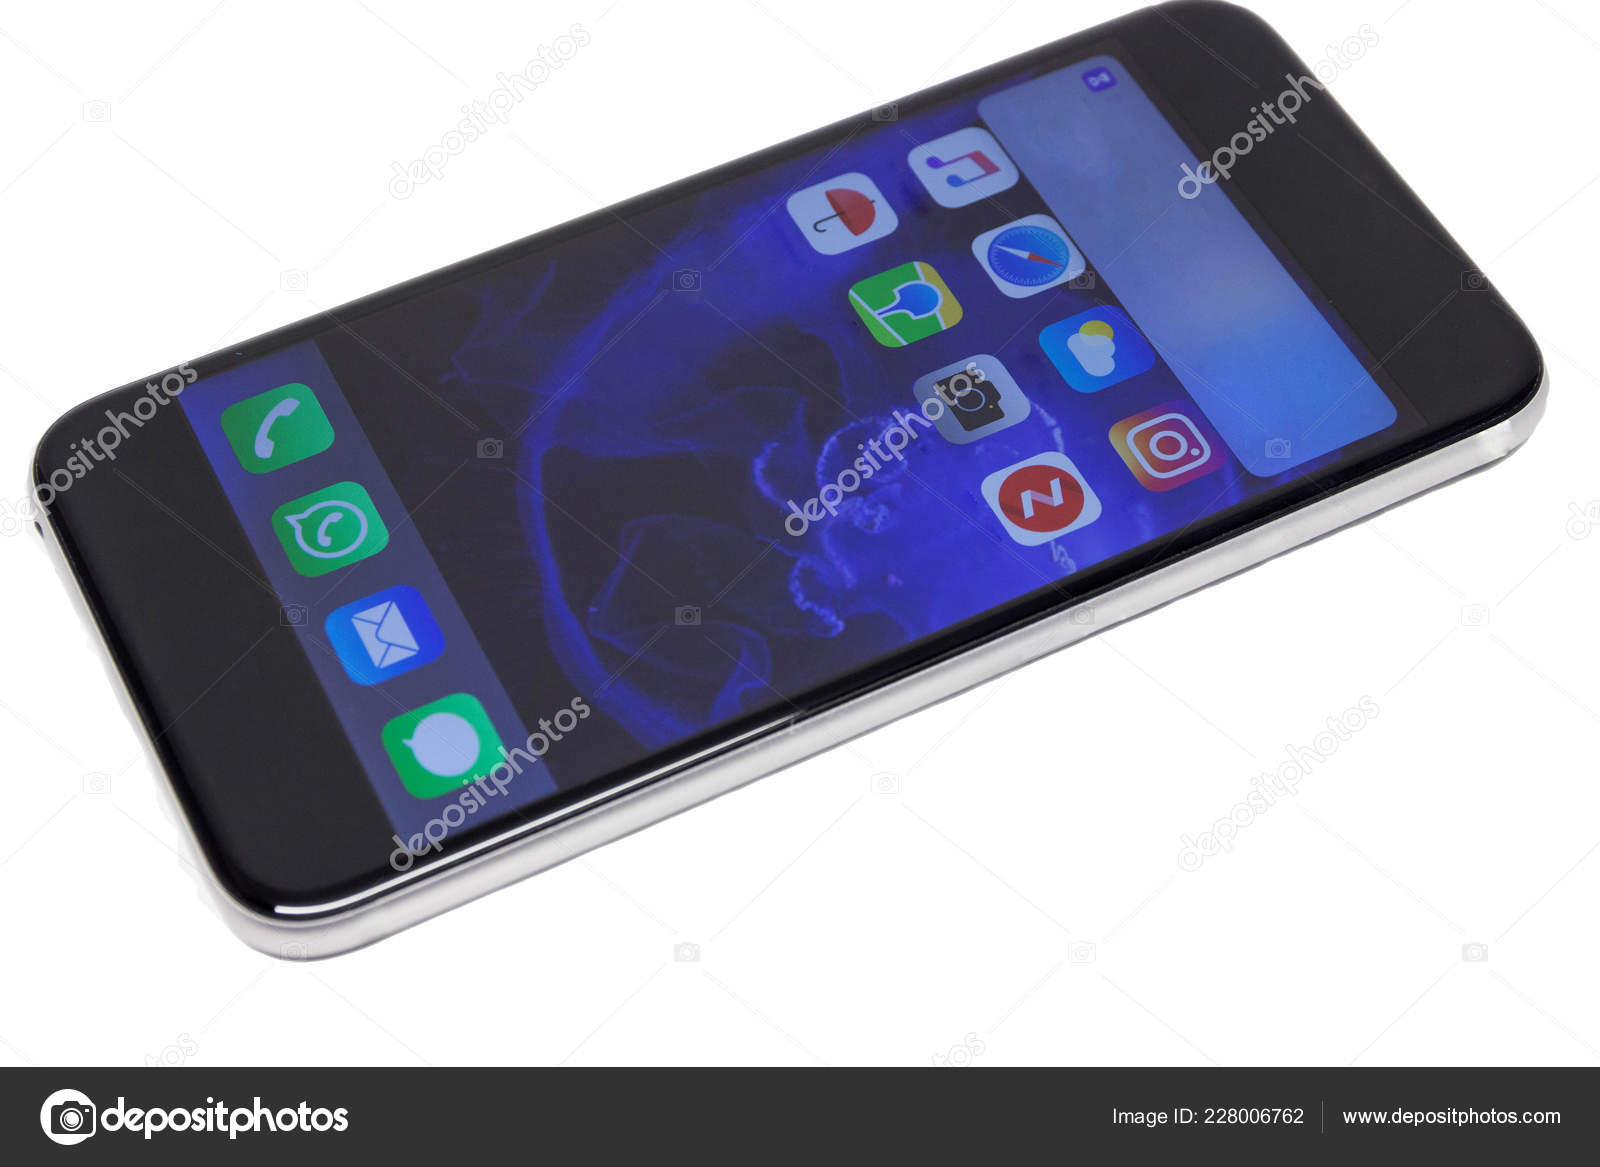 Wallpaper Hd Galaxy J7 Black Mobile Smart Phone Mock Game Design Smartphone Mobile Application Stock Editorial Photo C Sir Kuzmah2012 Yandex Ru 228006762